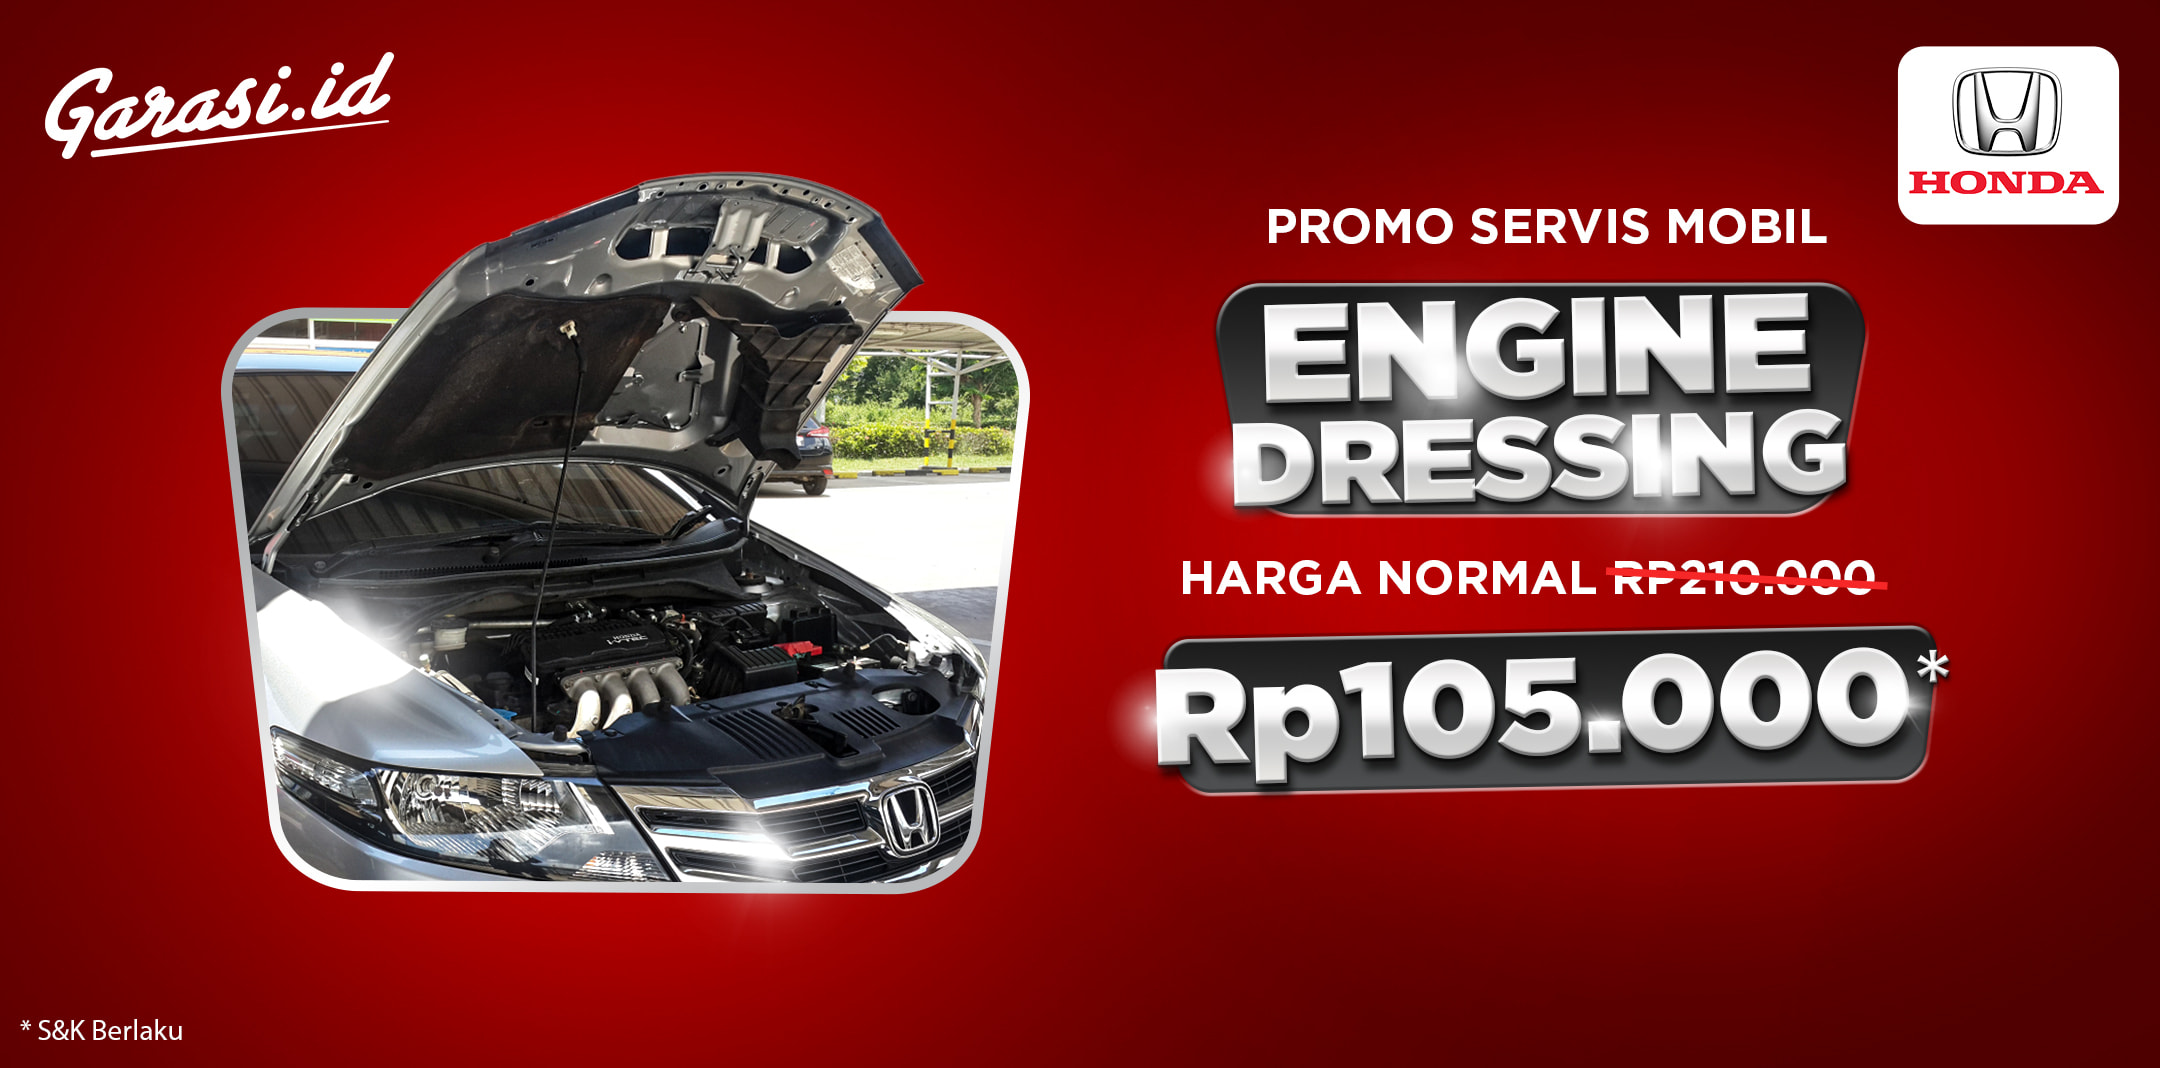 Promo Honda Tangerang